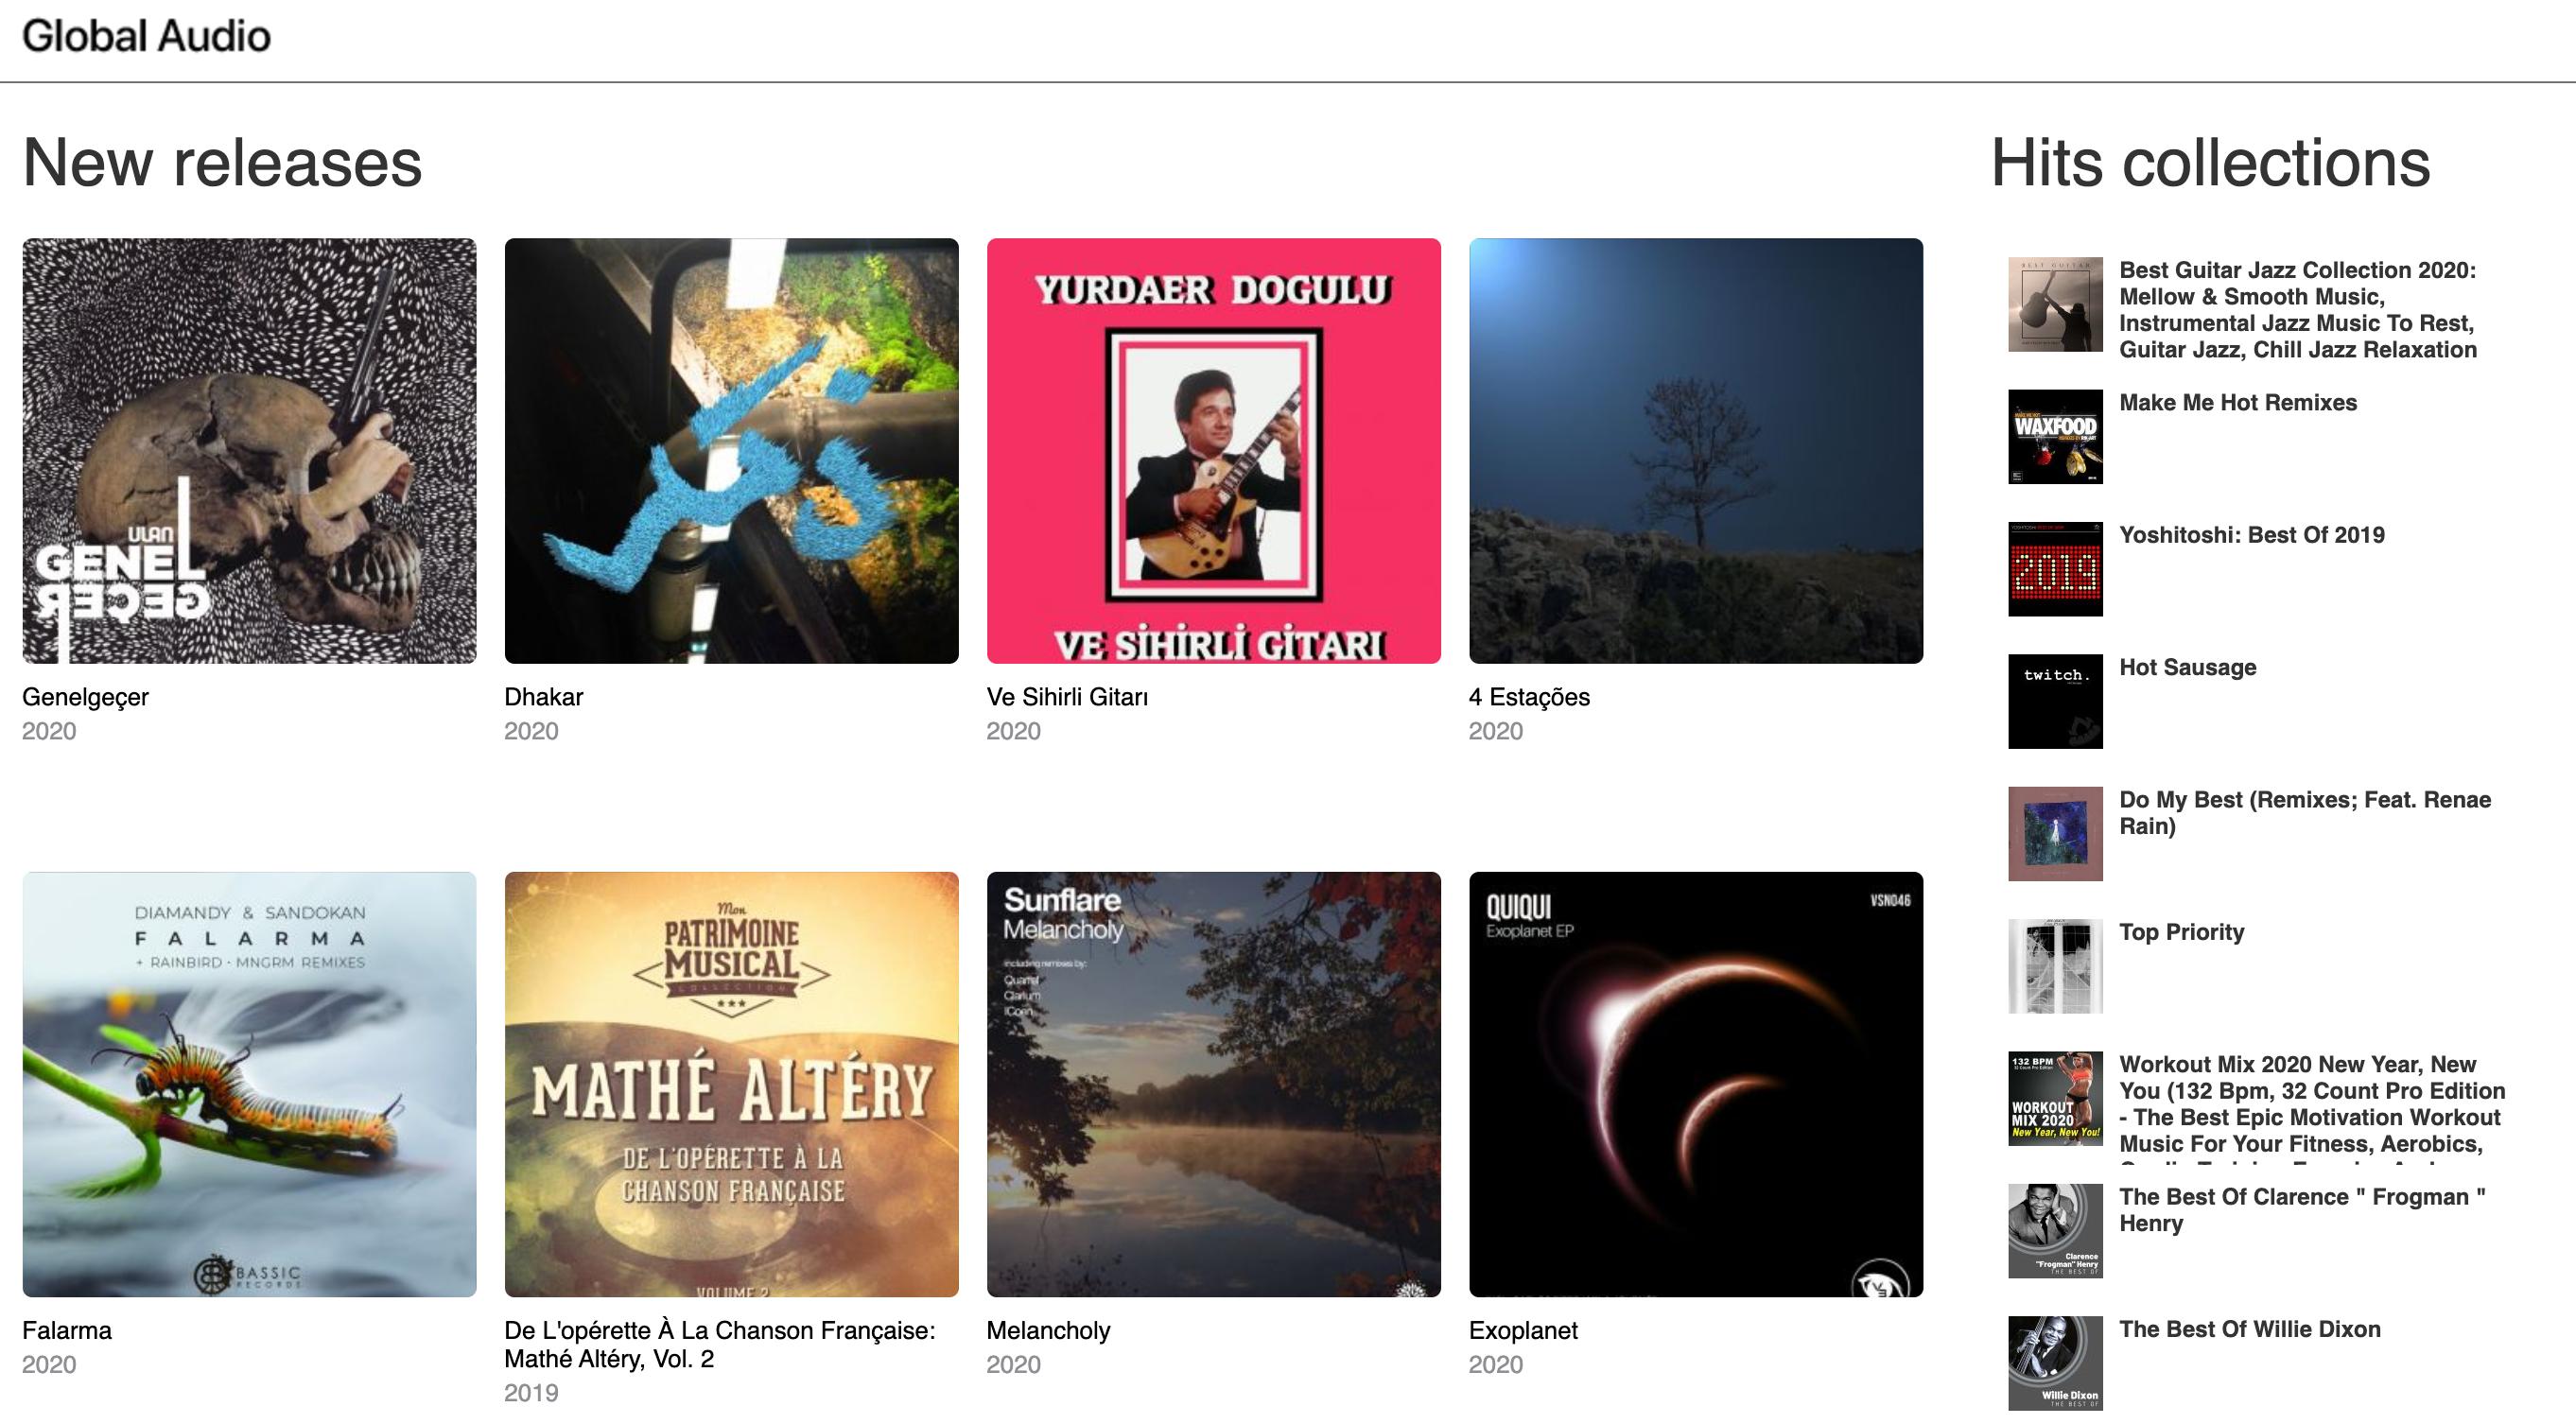 музыкальный сайт Global Audio